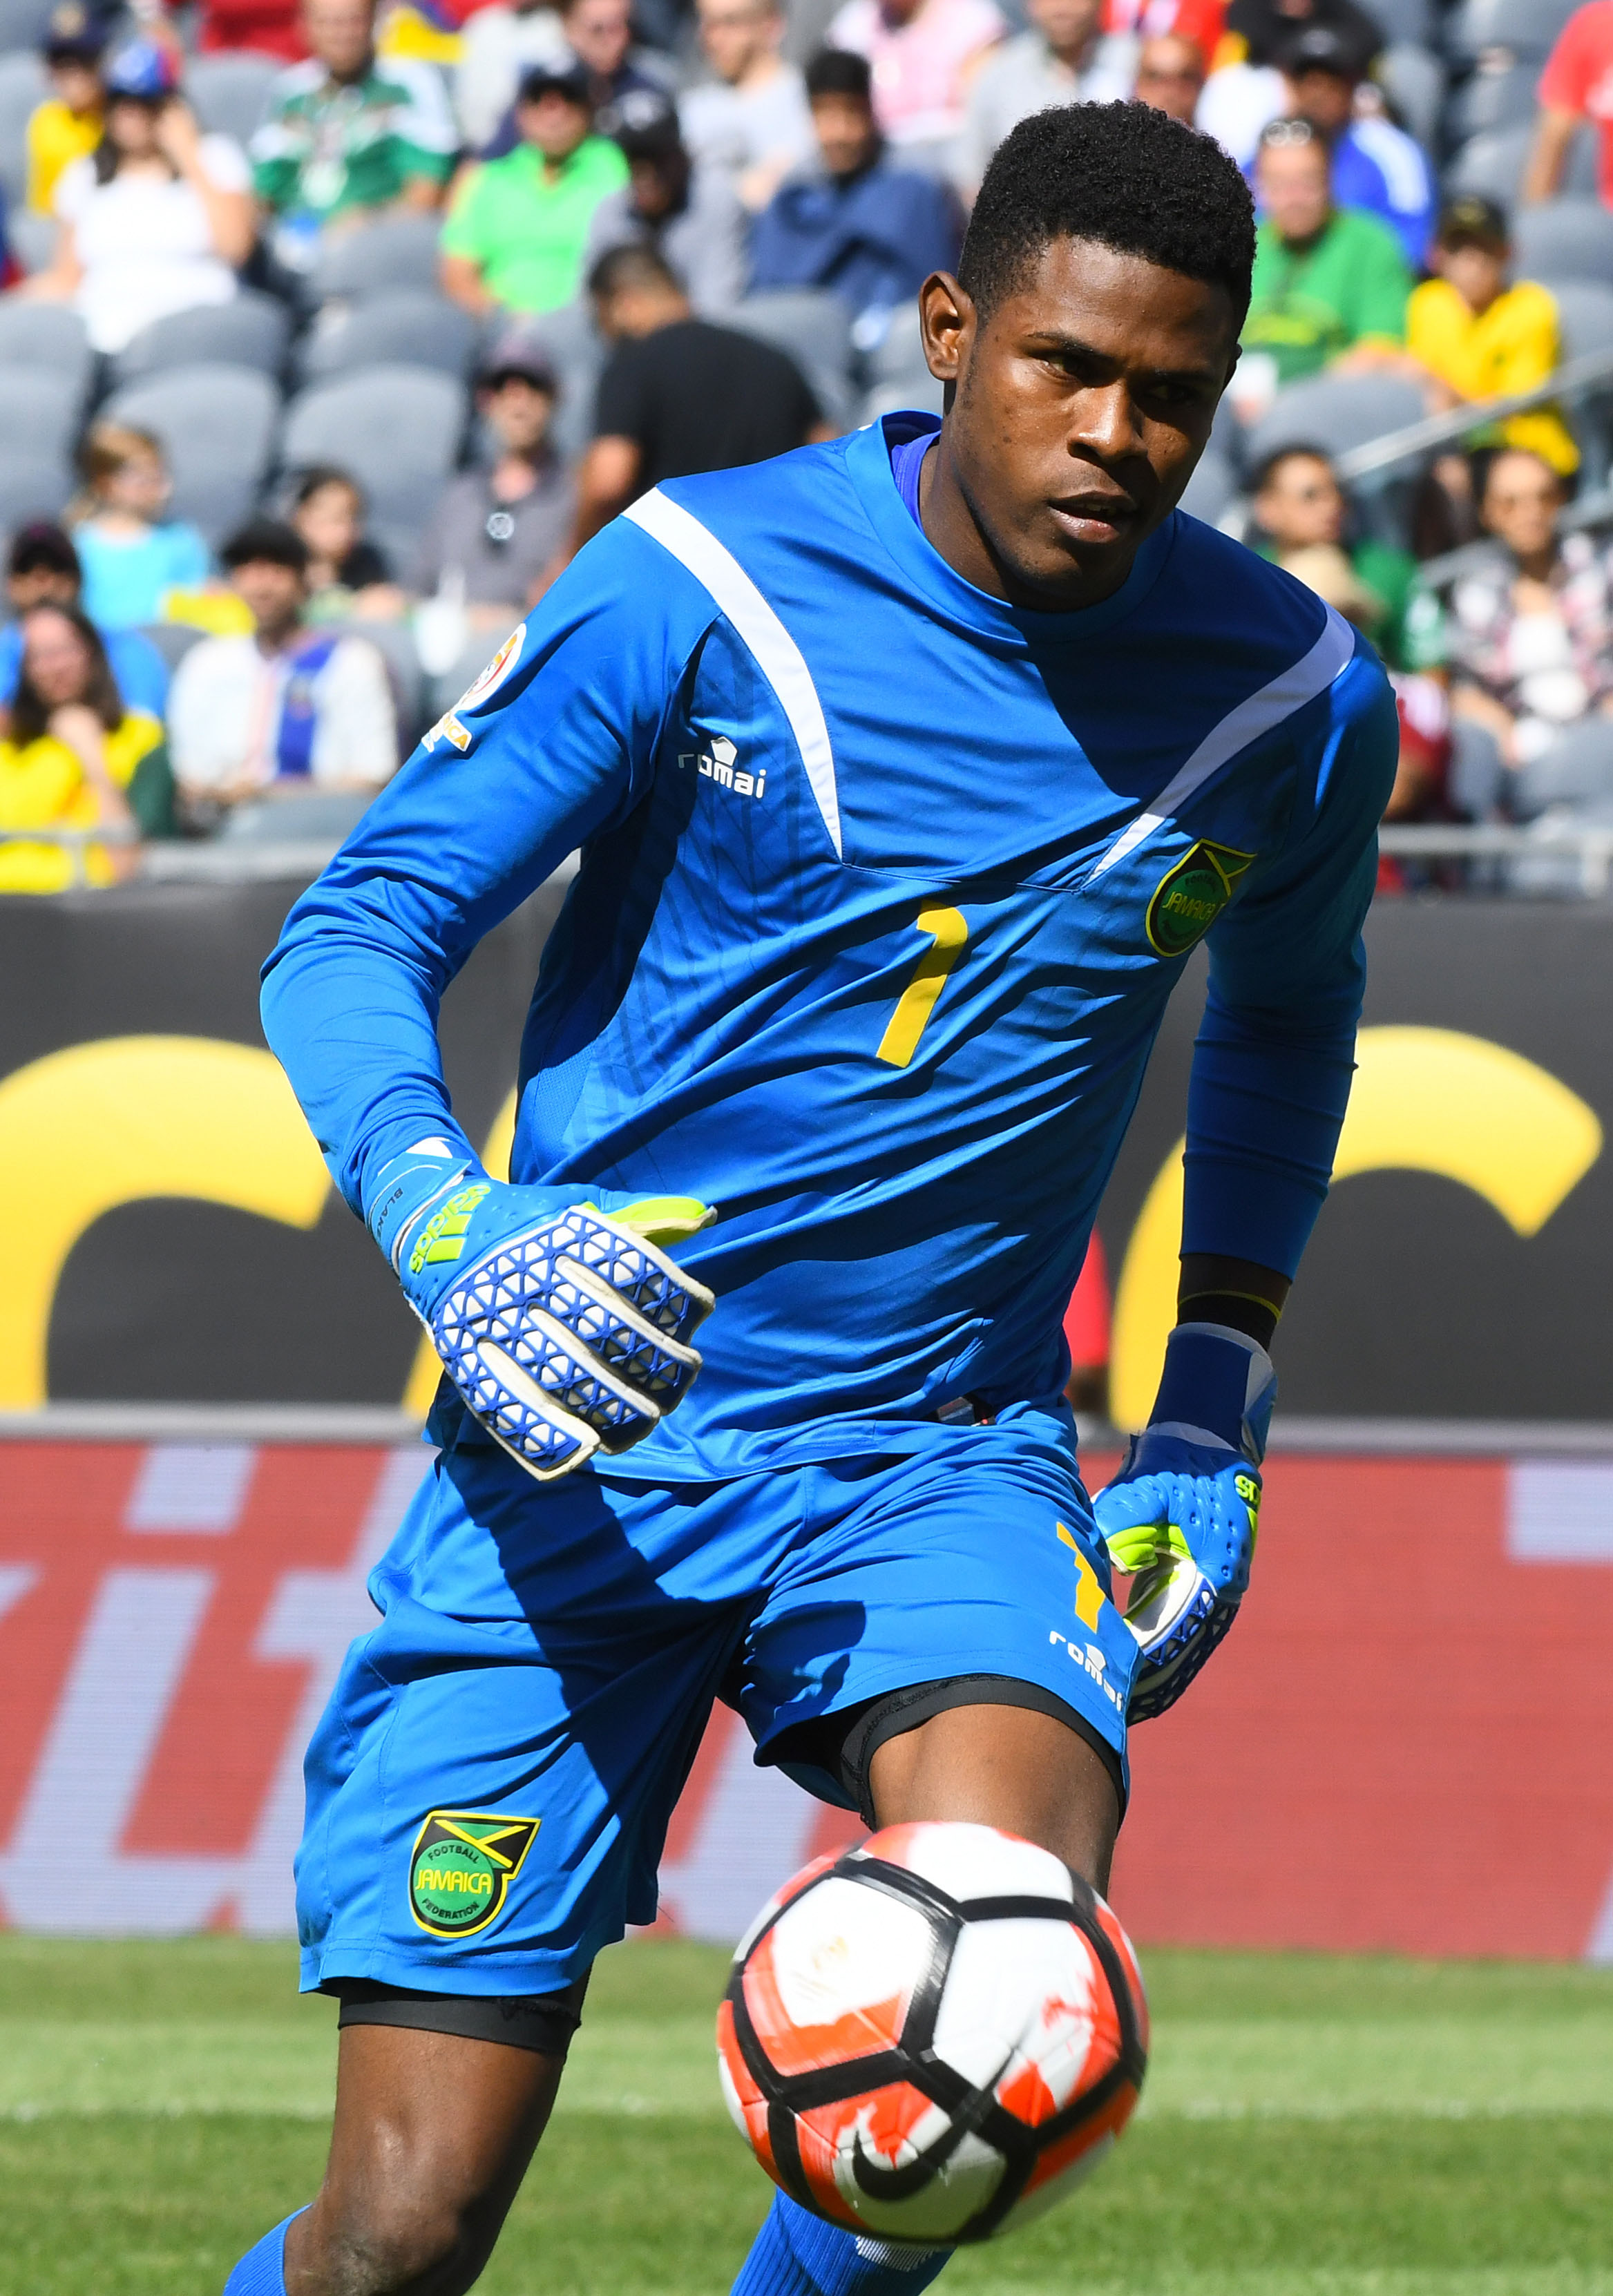 Soccer: 2016 Copa America Centenario-Jamaica at Venezuela